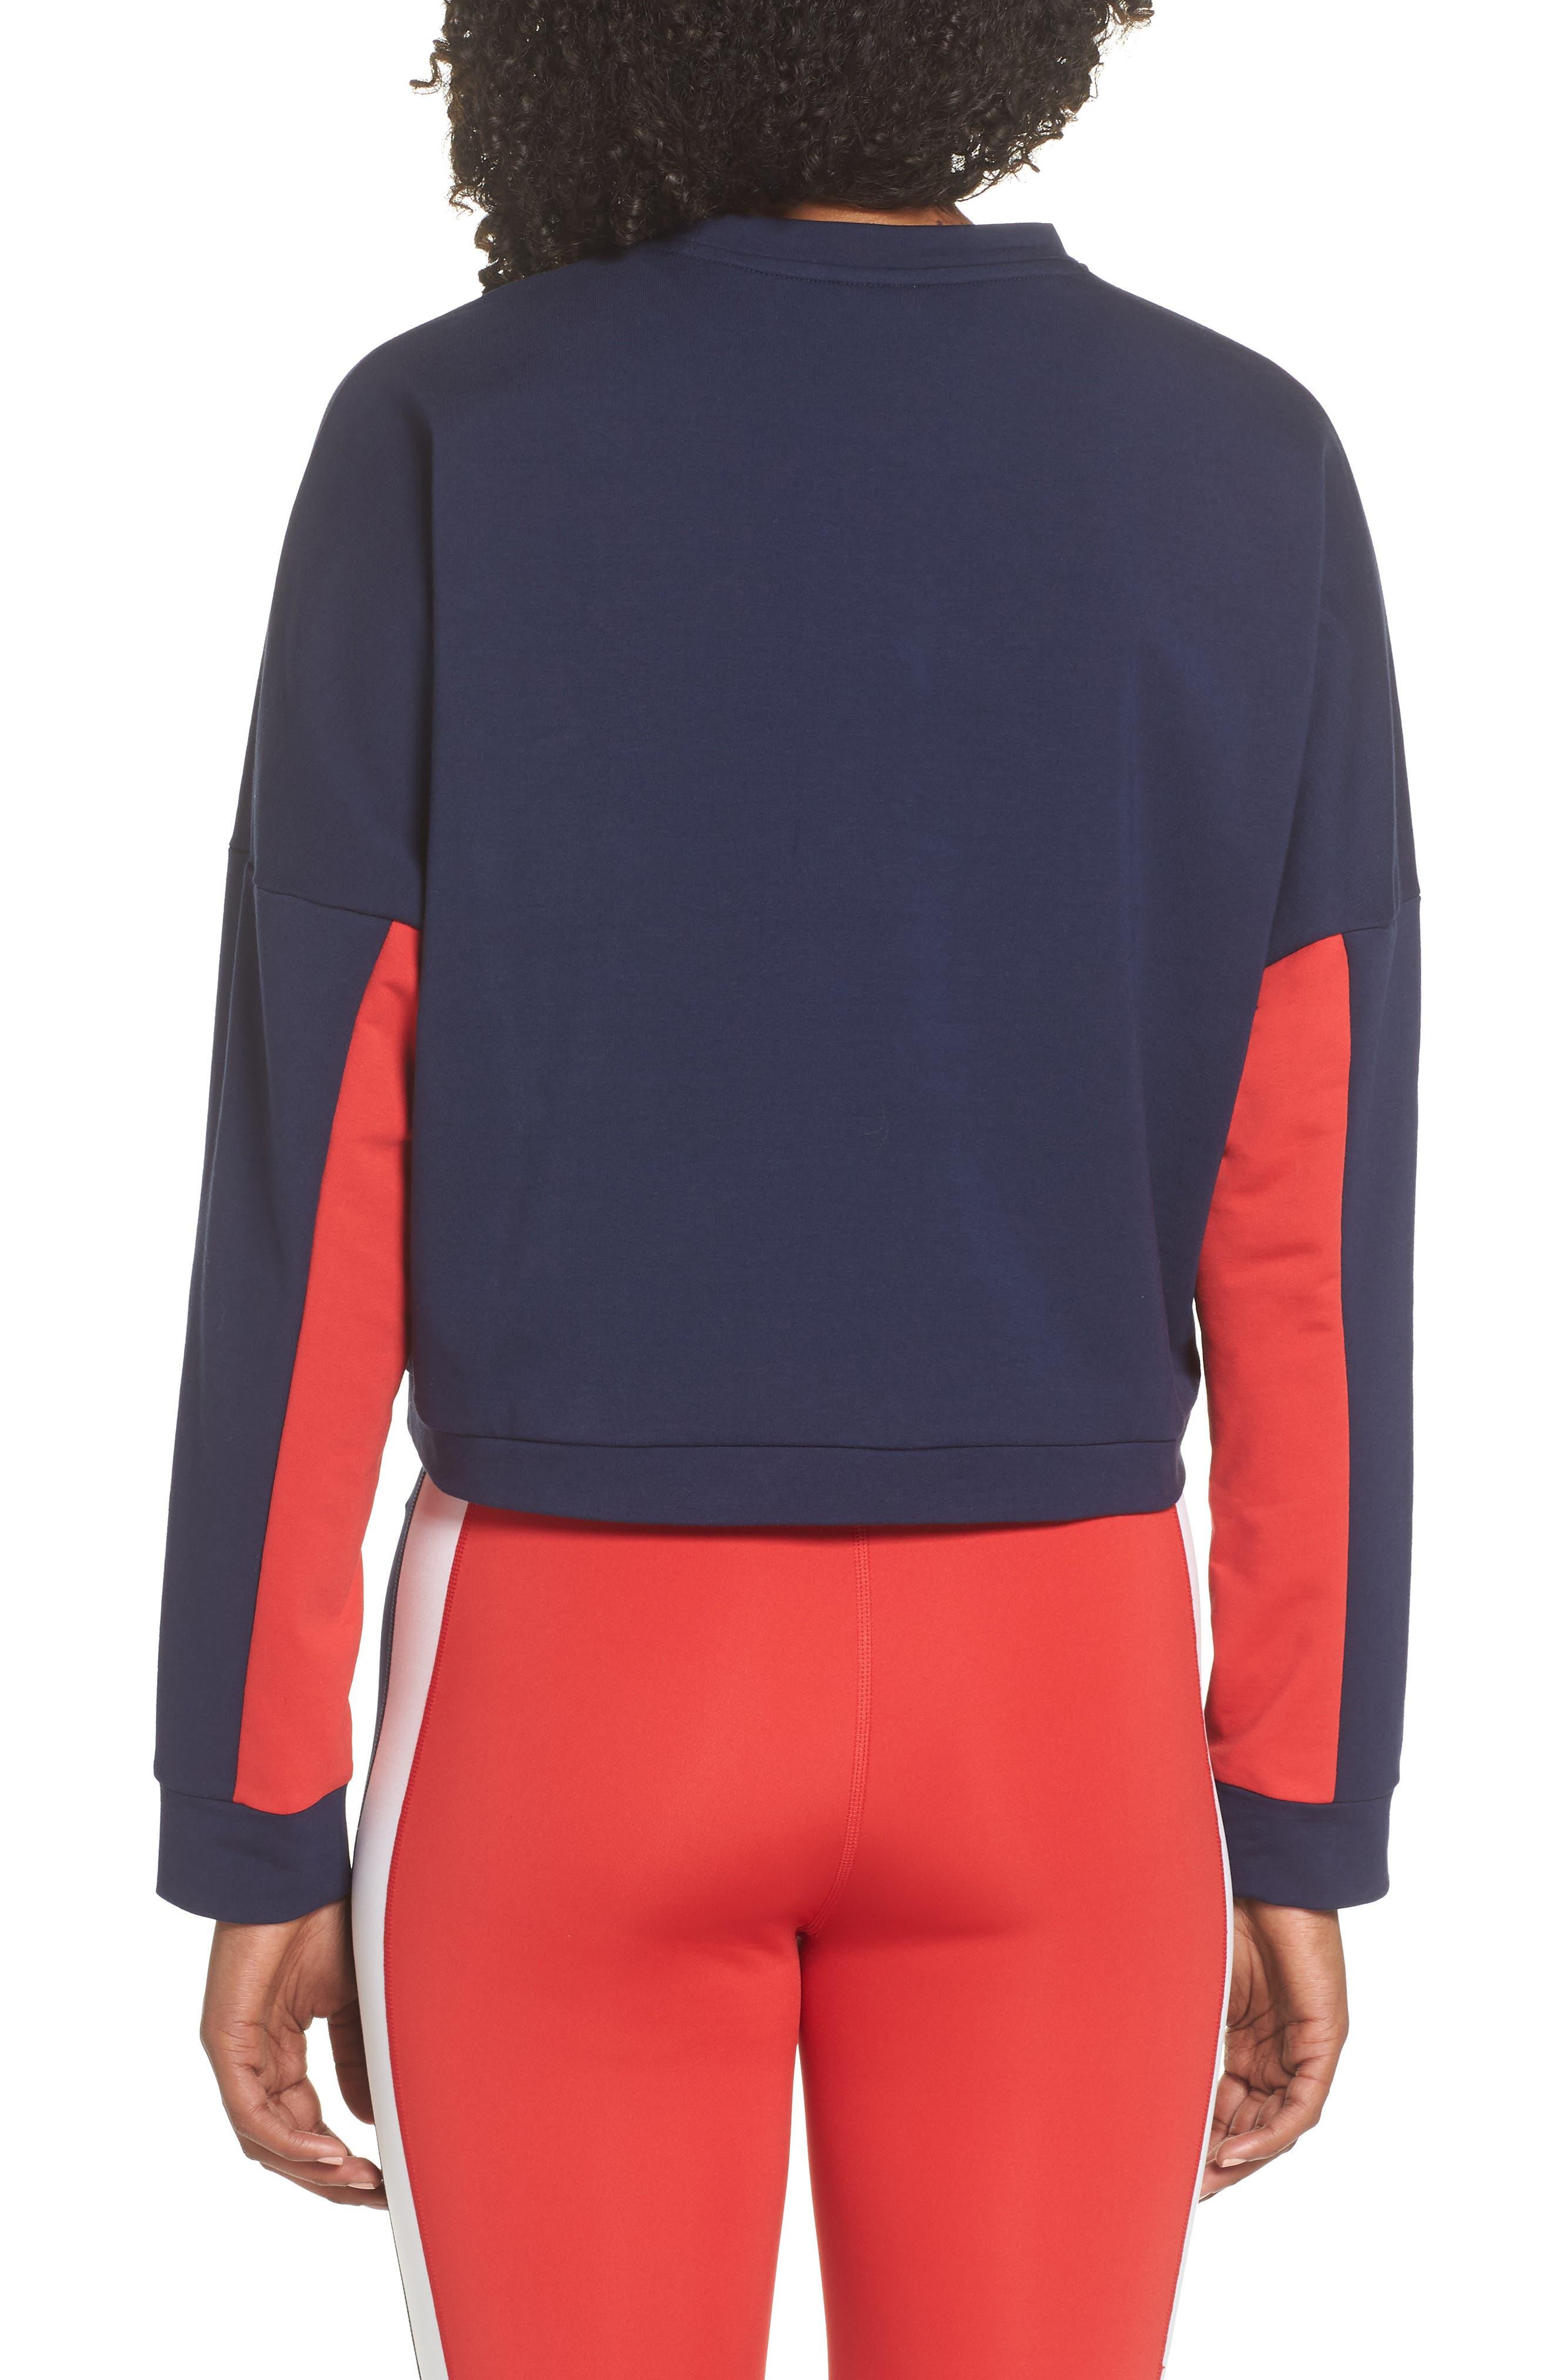 Modern Sport Sweatshirt,                             Alternate thumbnail 2, color,                             710